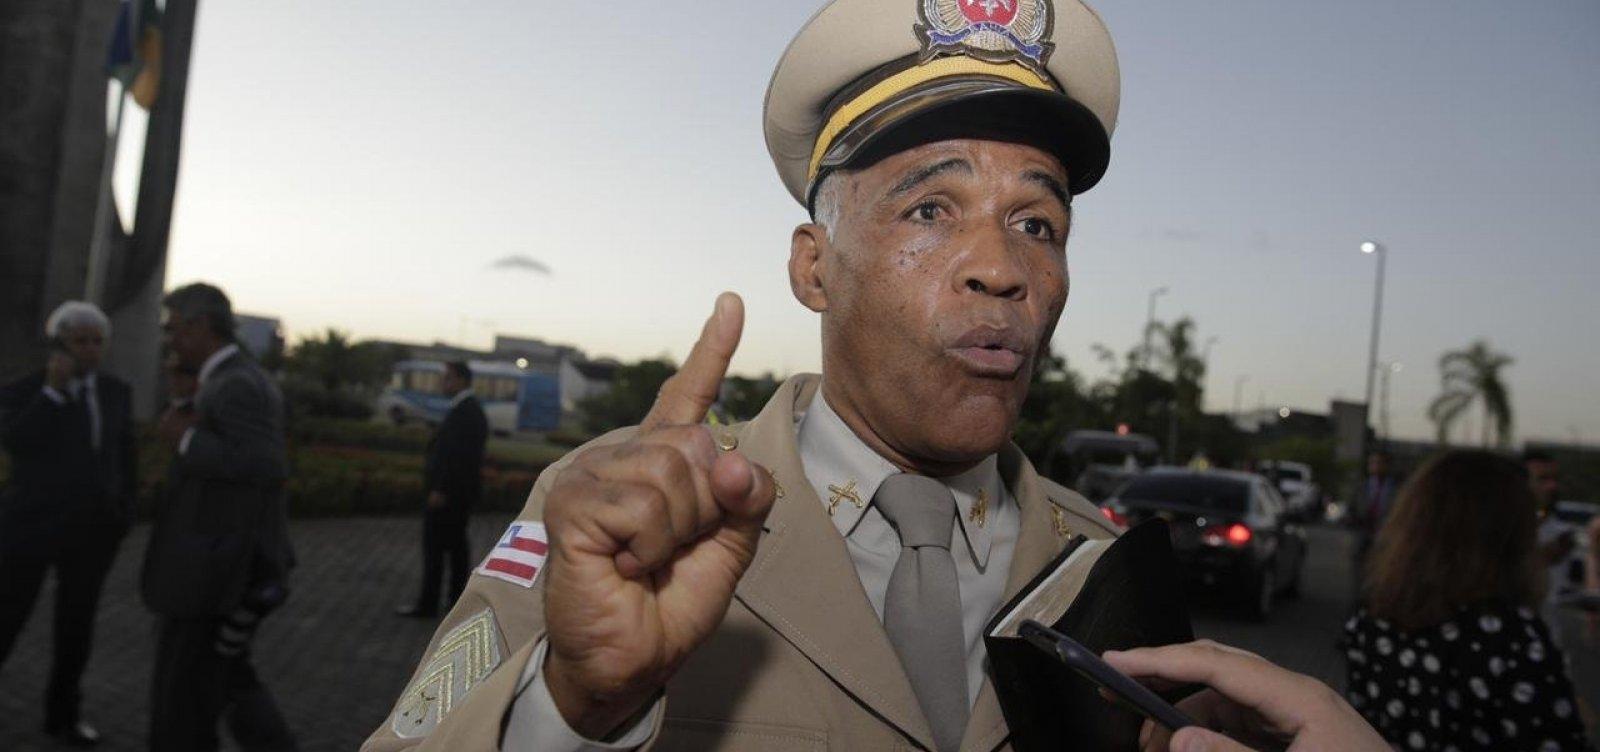 [Após declarar voto em Haddad, Isidório diz que pode apoiar Bolsonaro]